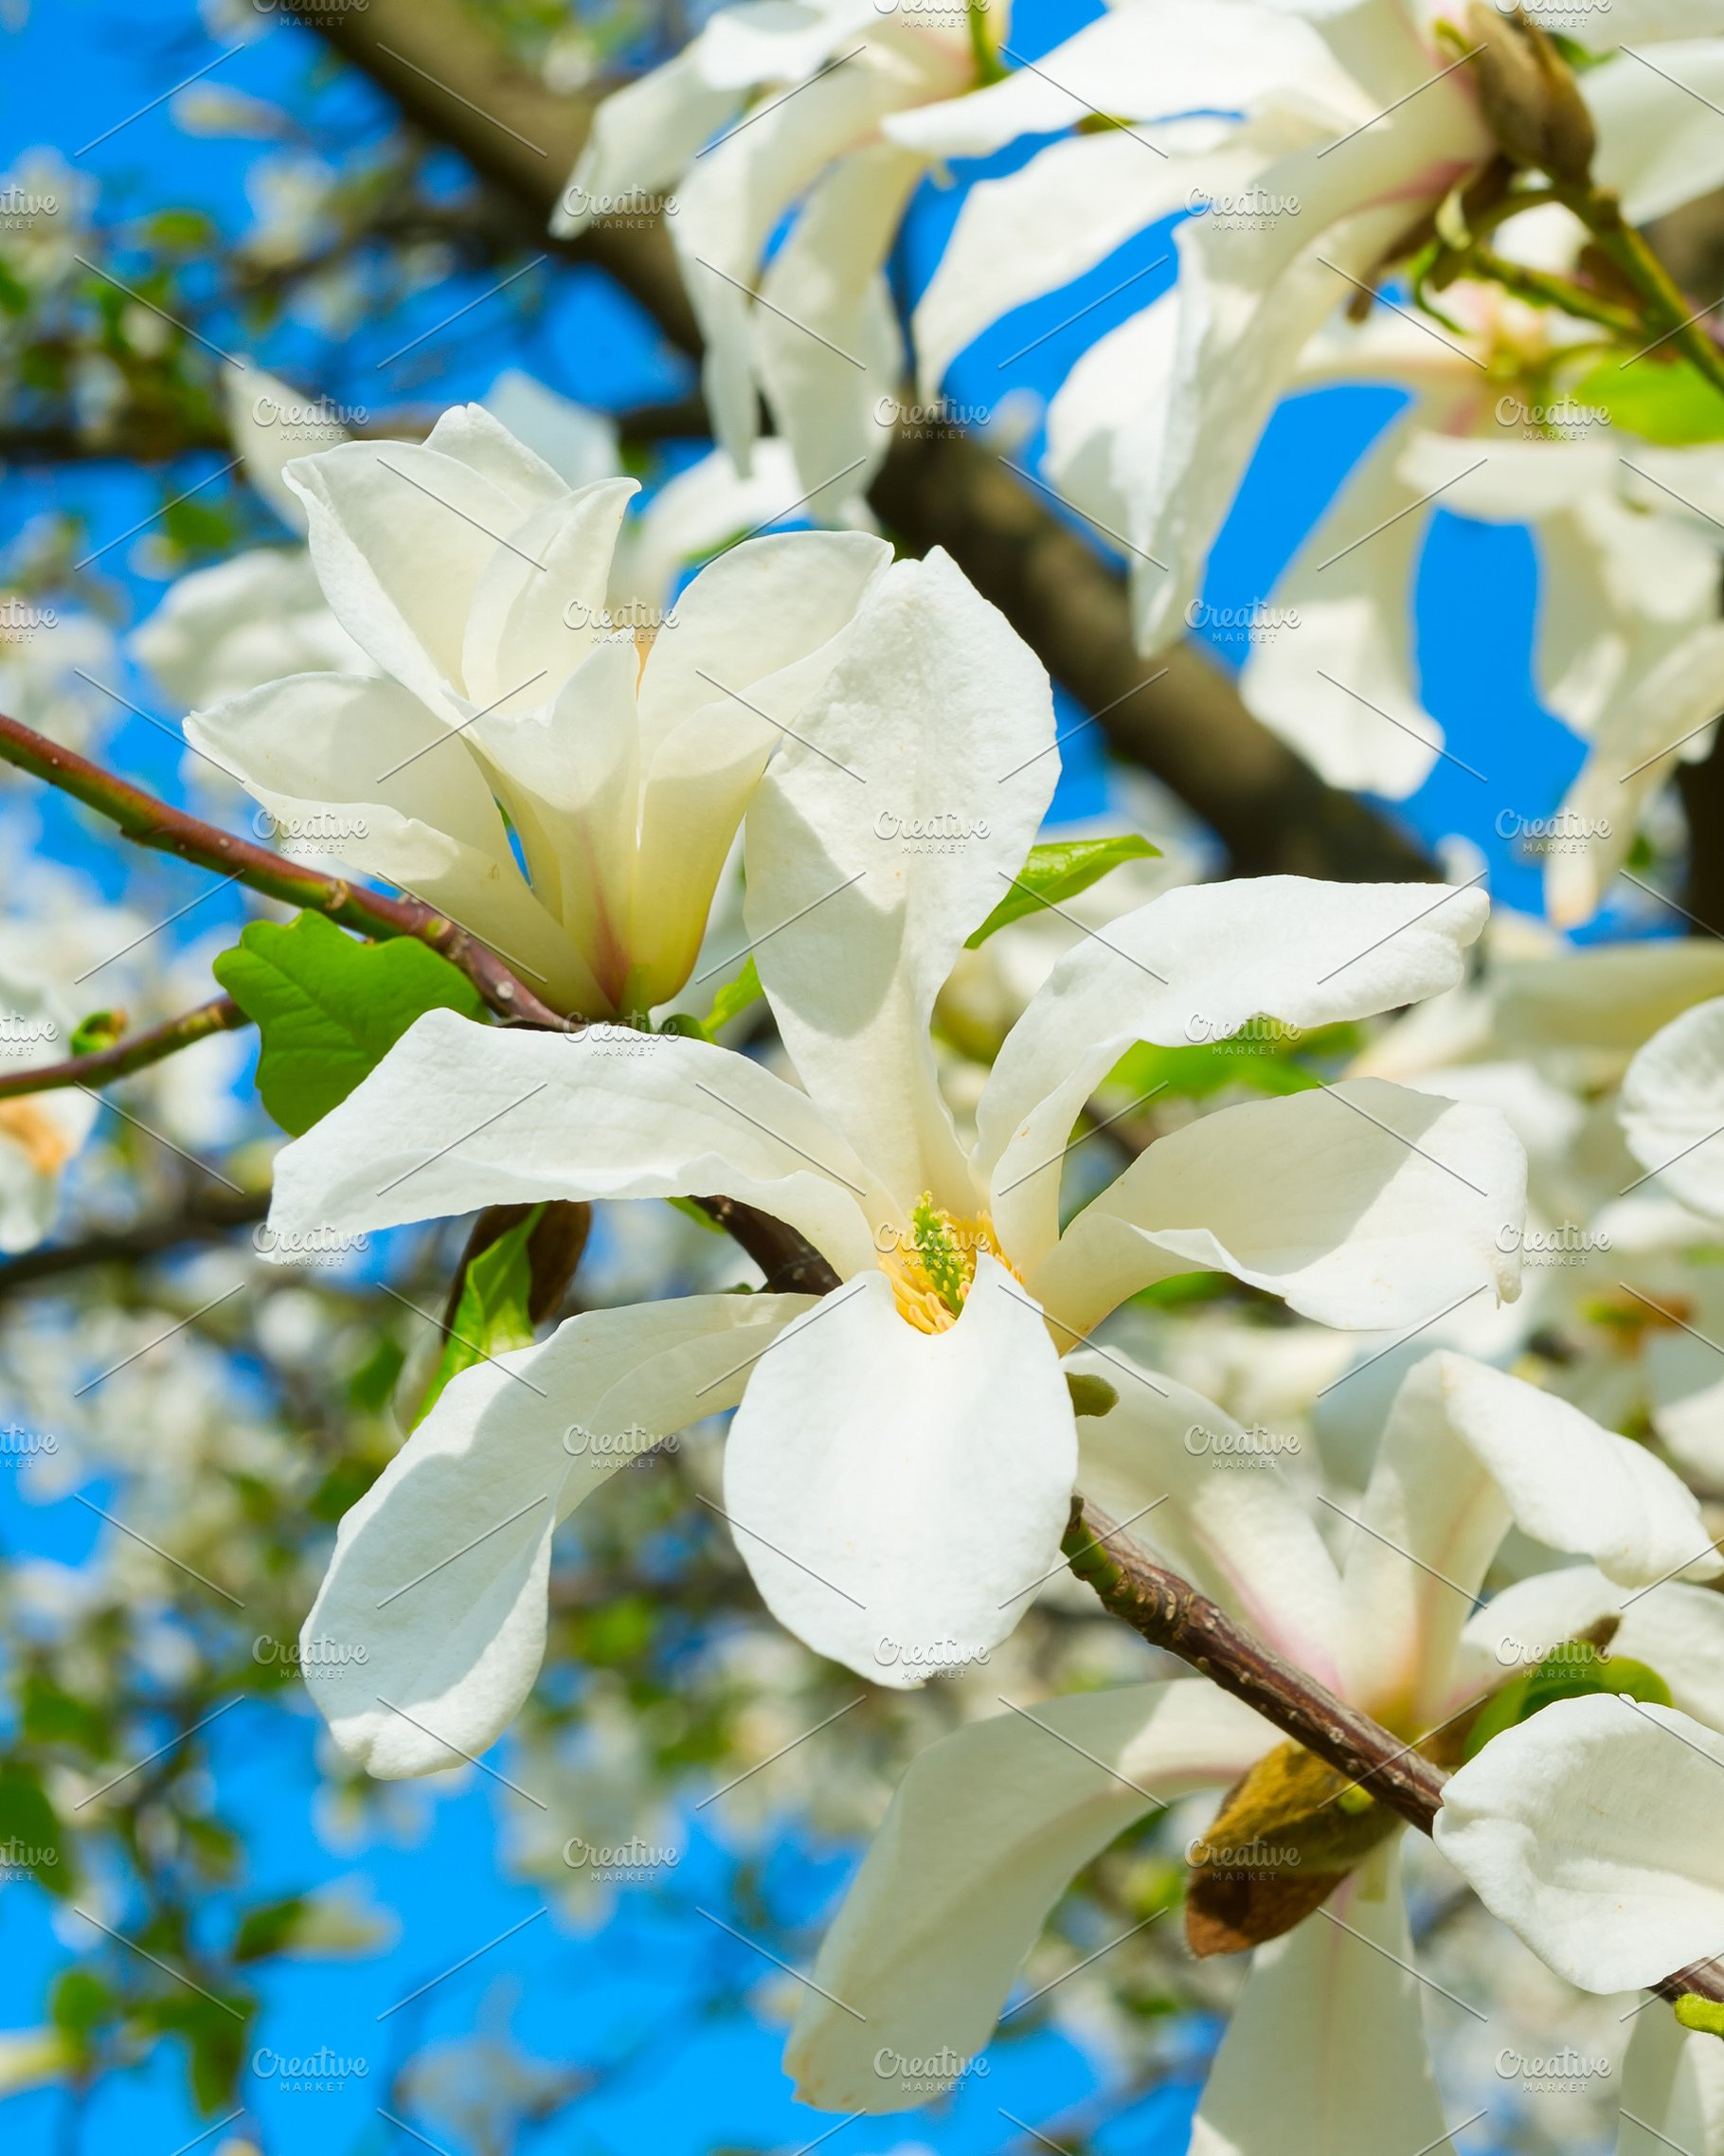 White Blossom Magnolia Tree Flowers Nature Photos Creative Market